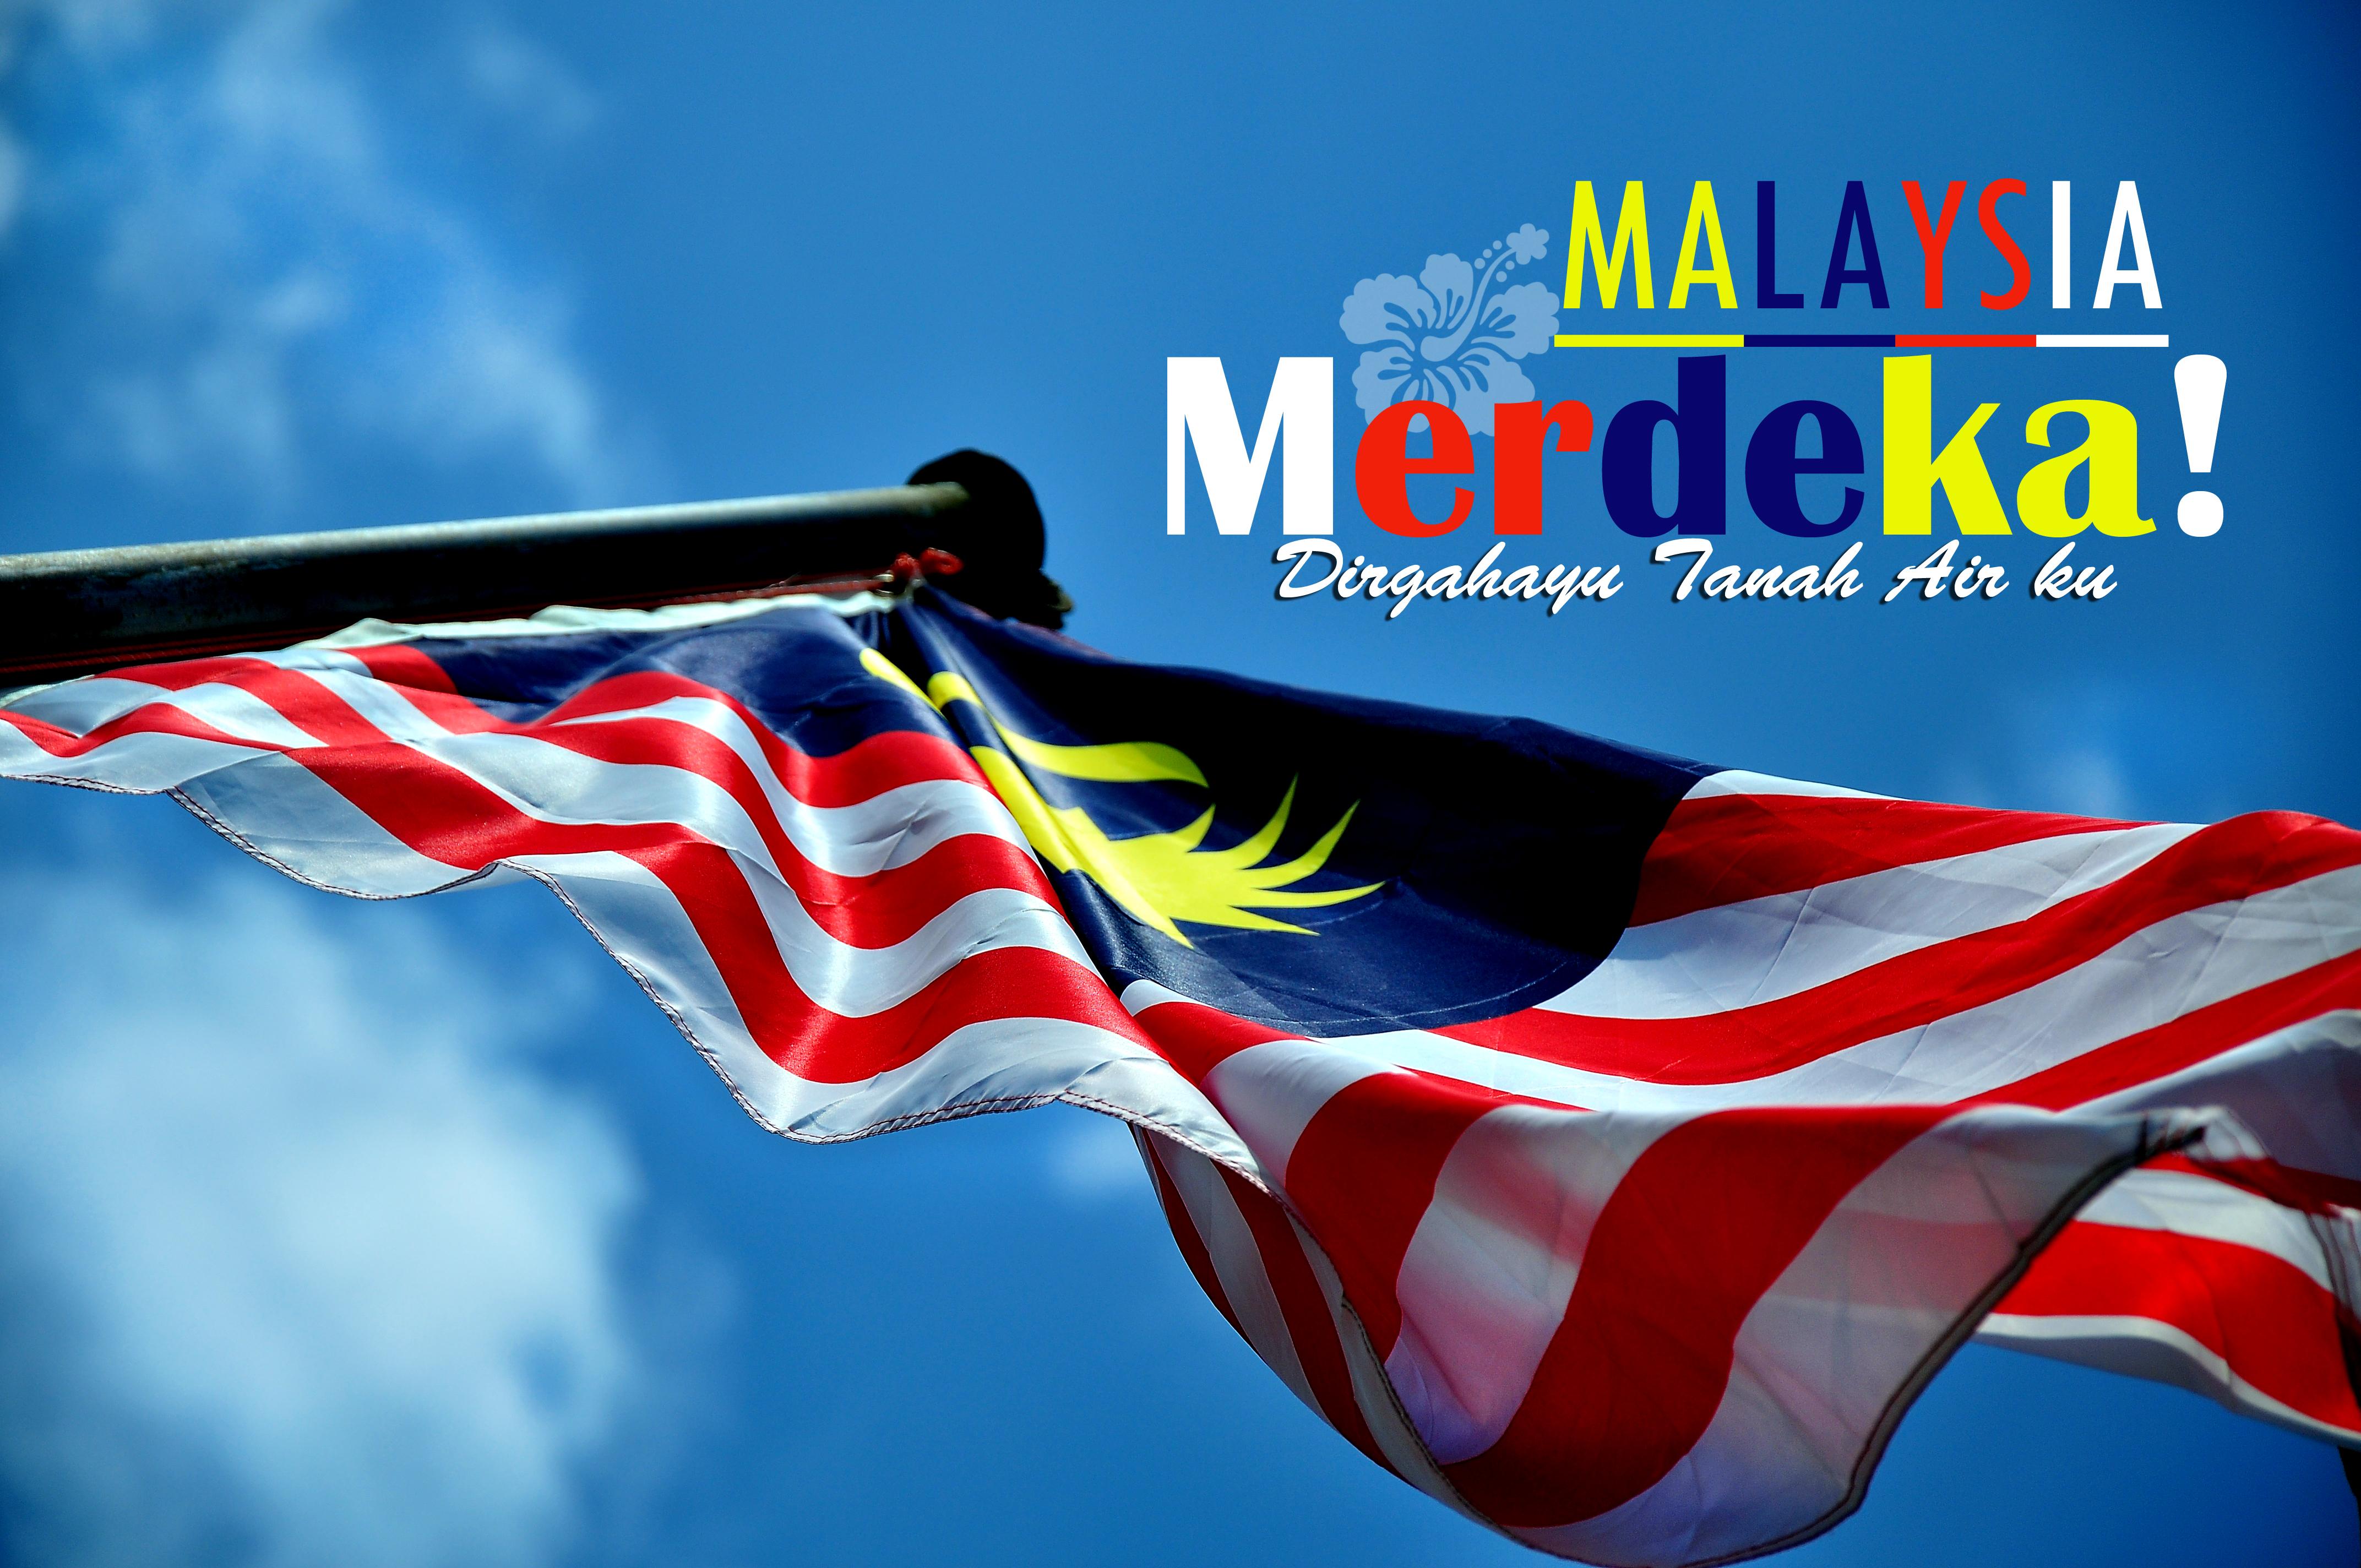 Selamat Menyambut Hari Ke Merdeka An Happy Malaysia Independence Day